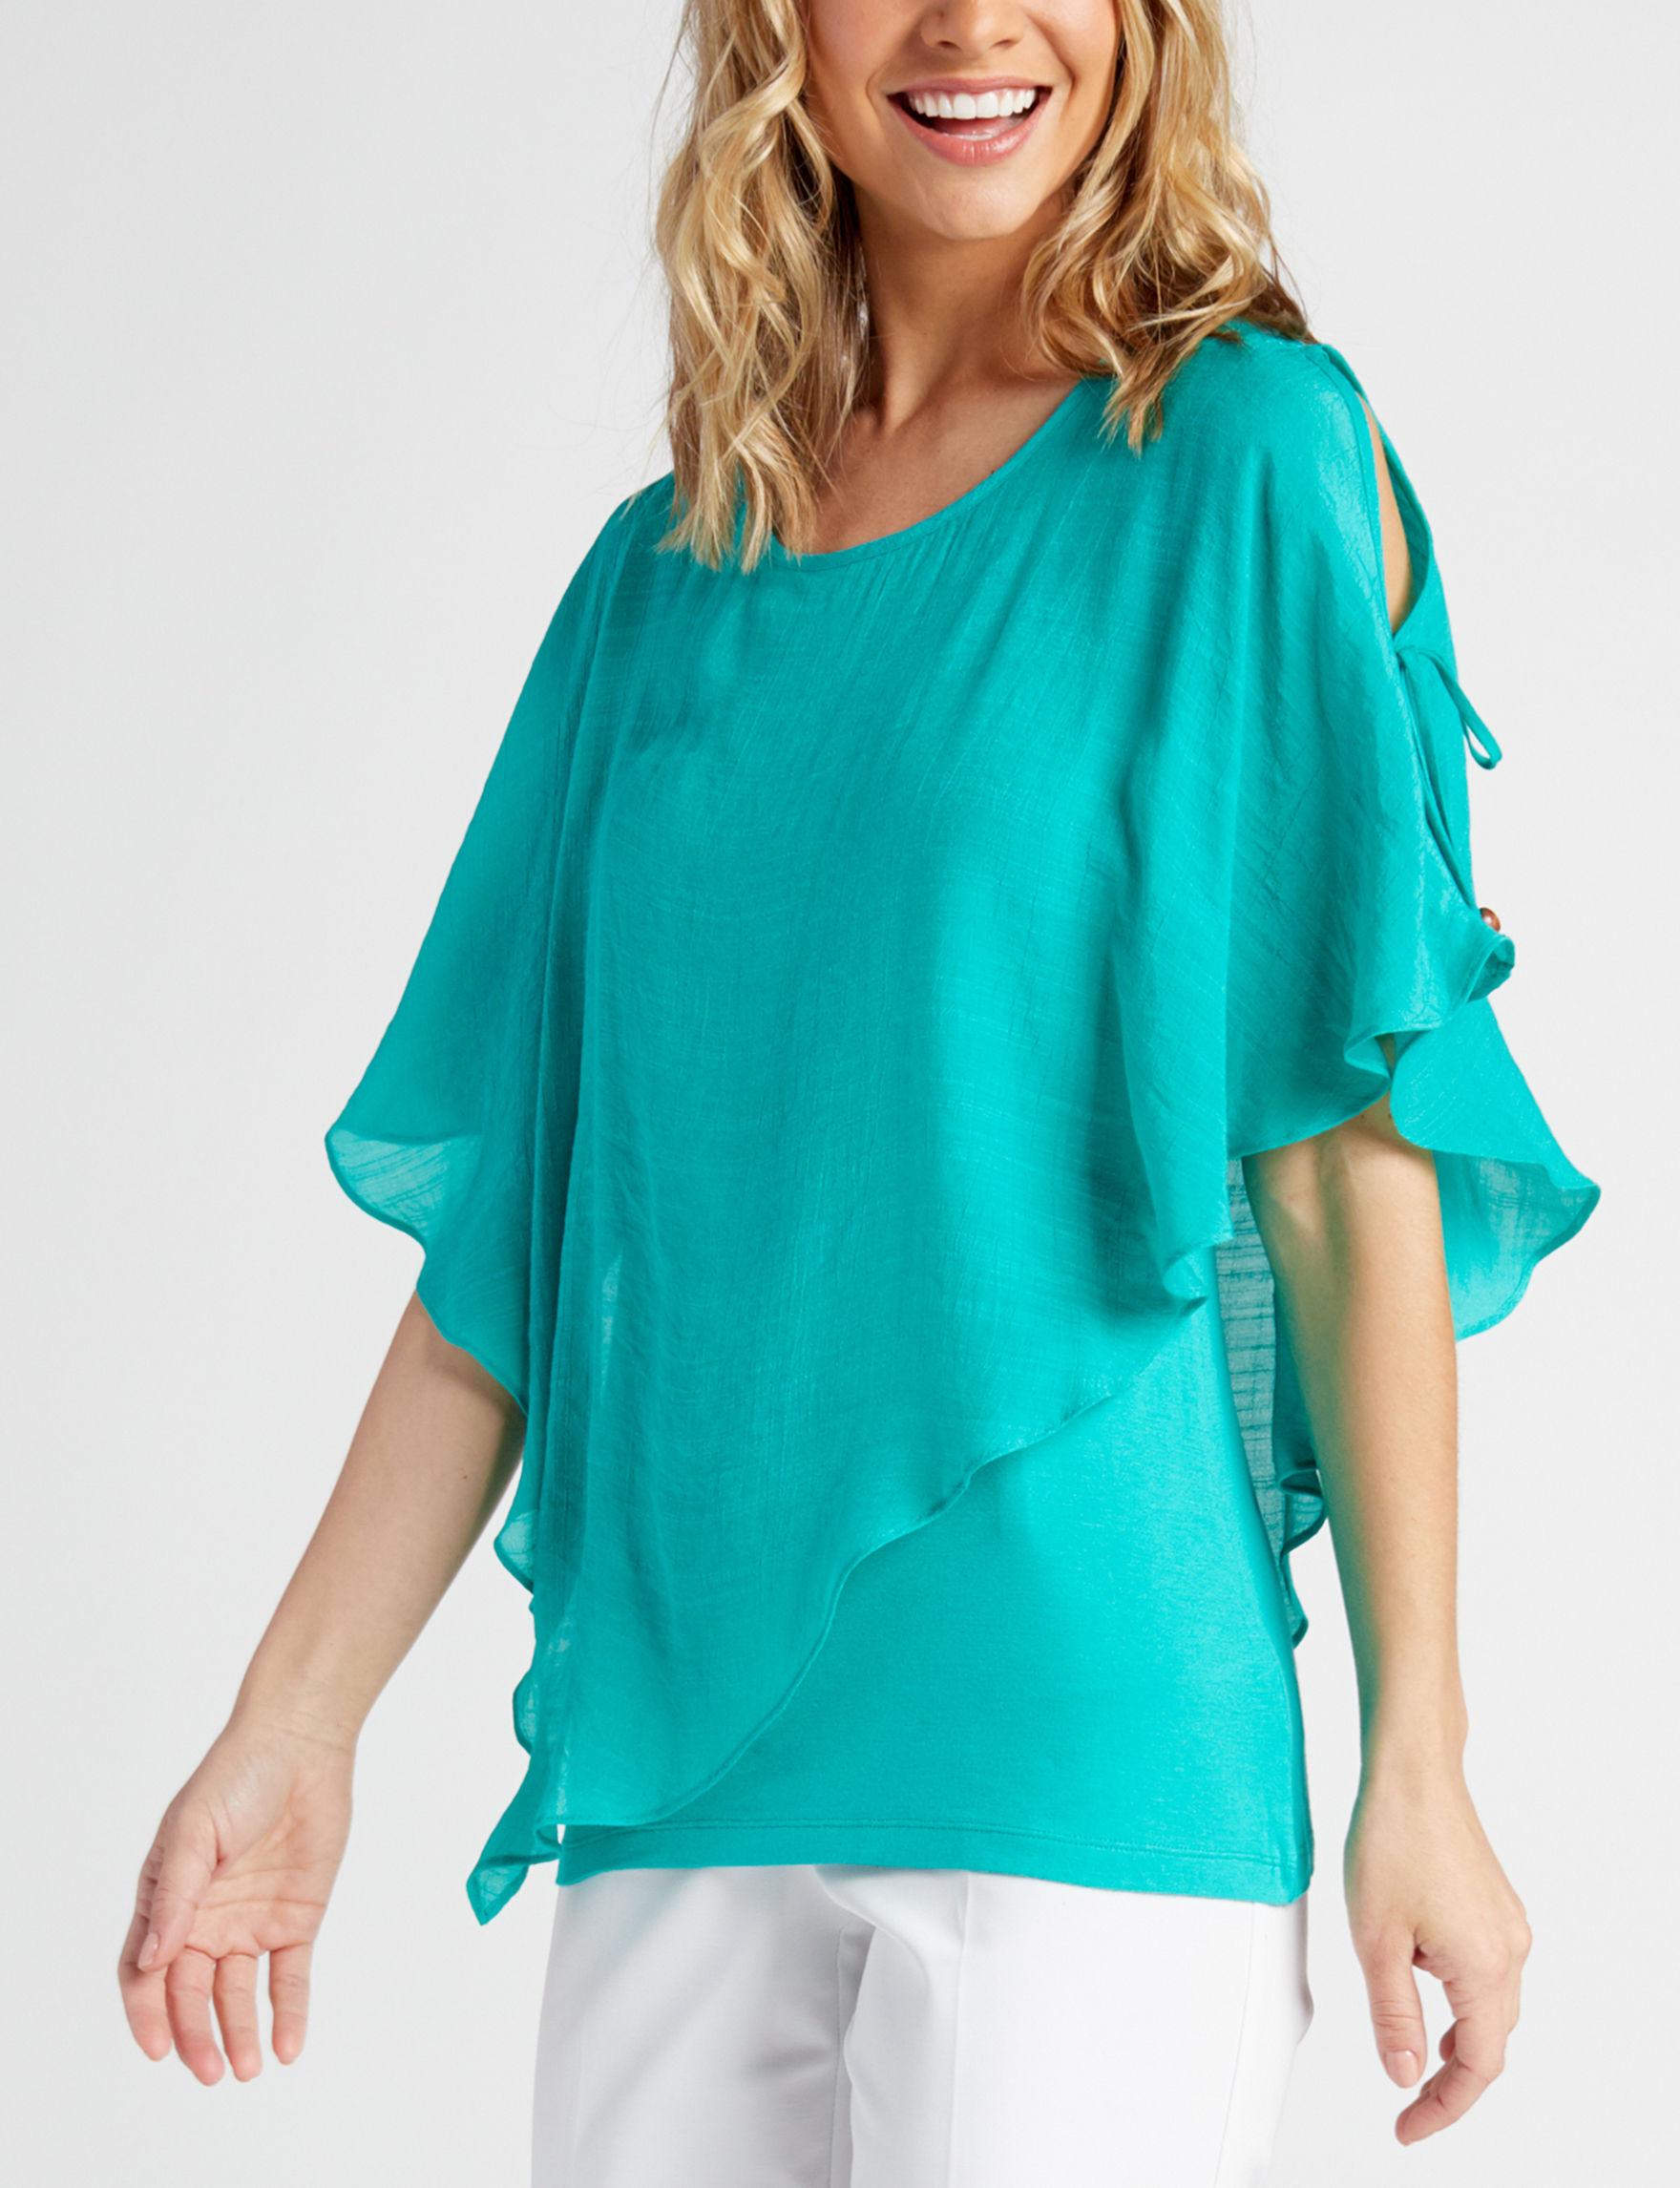 A. Byer Green Shirts & Blouses